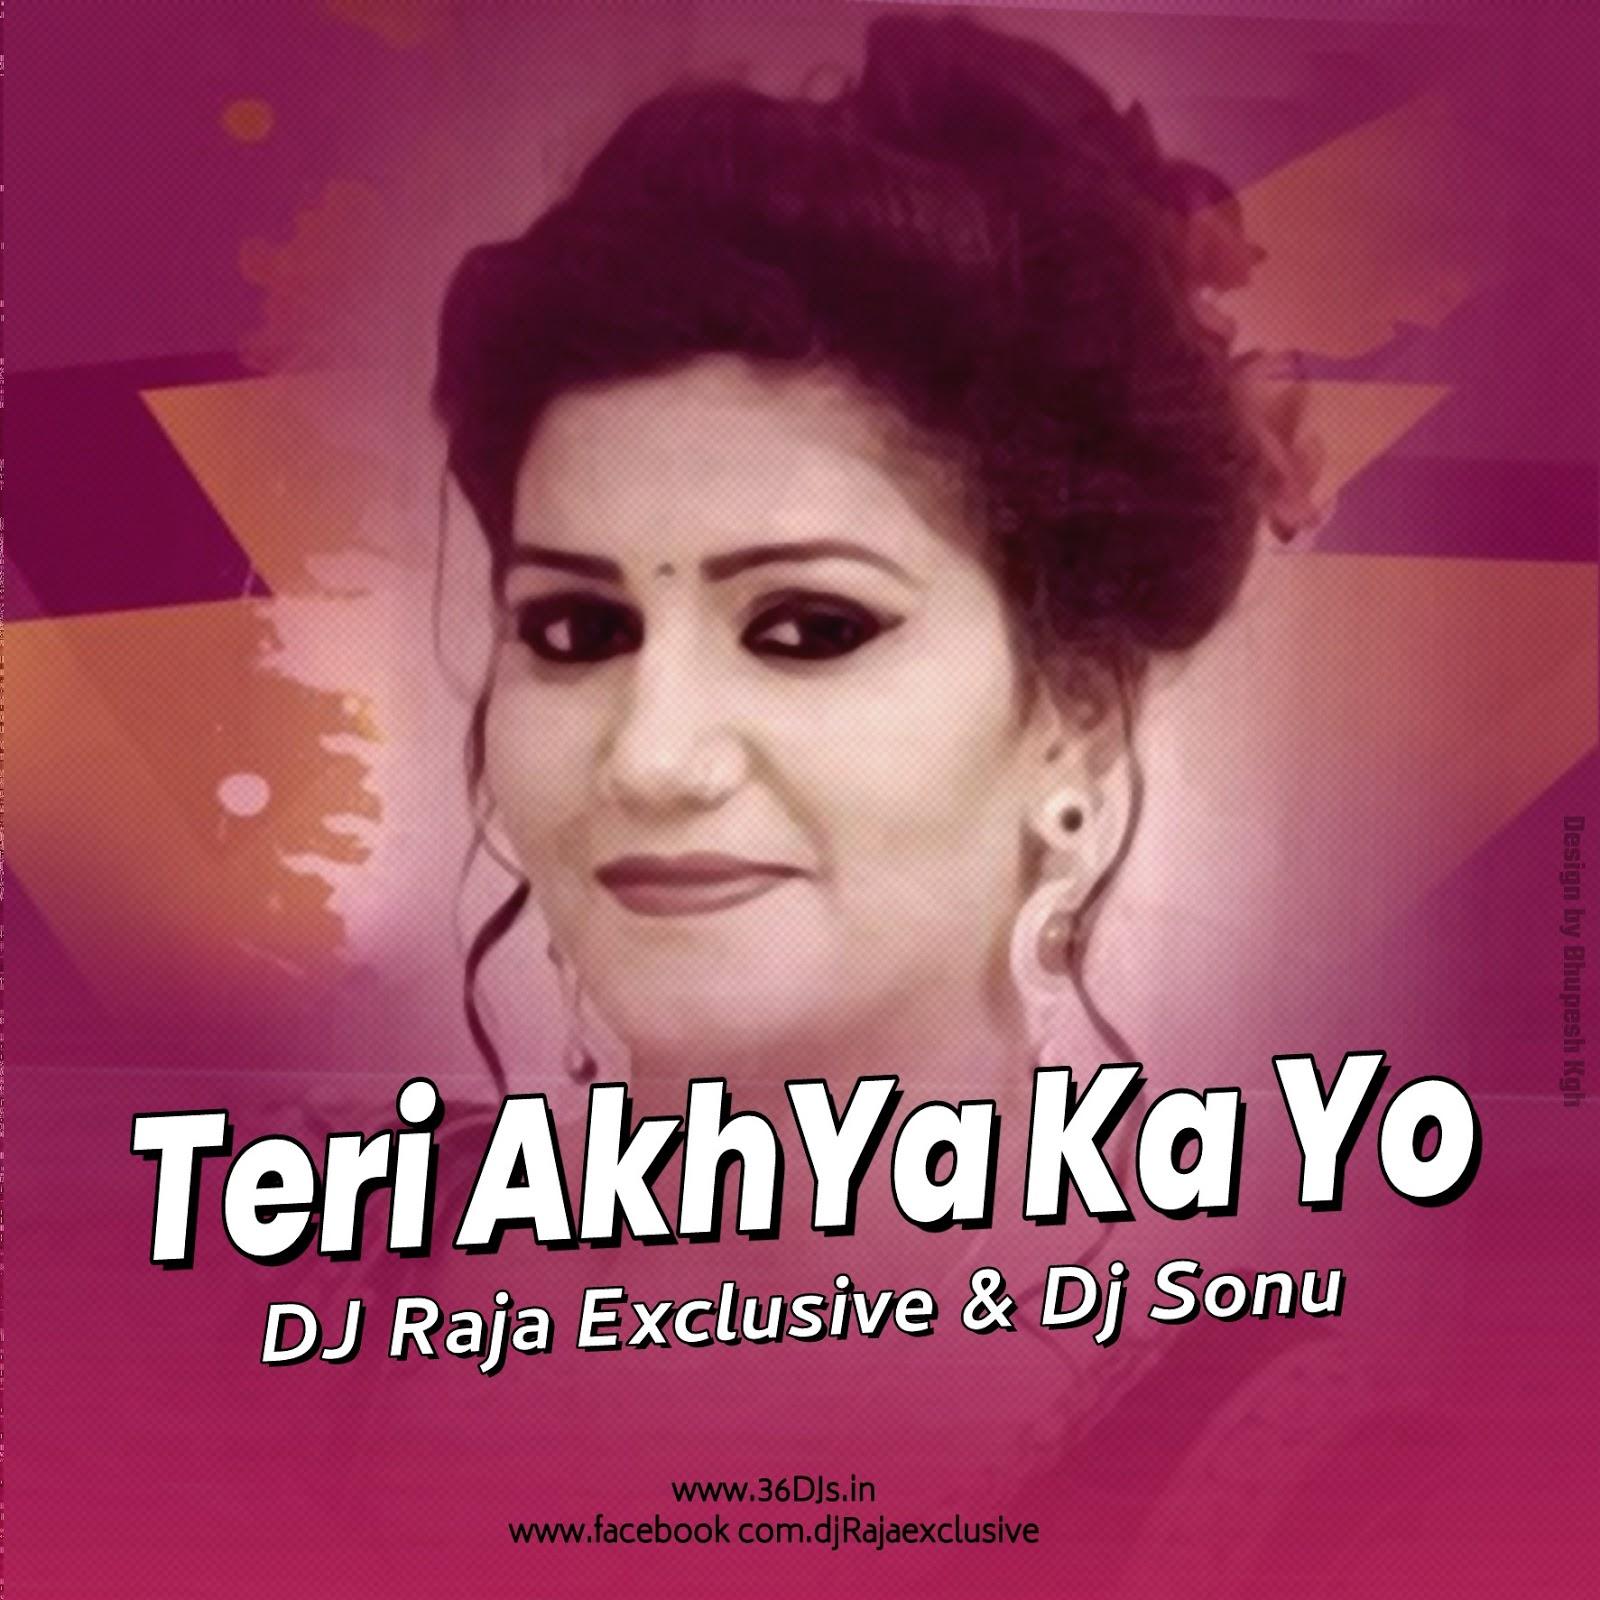 Teri Akhiyan Ka Kajal Download 2: Dj Raja Exclusive